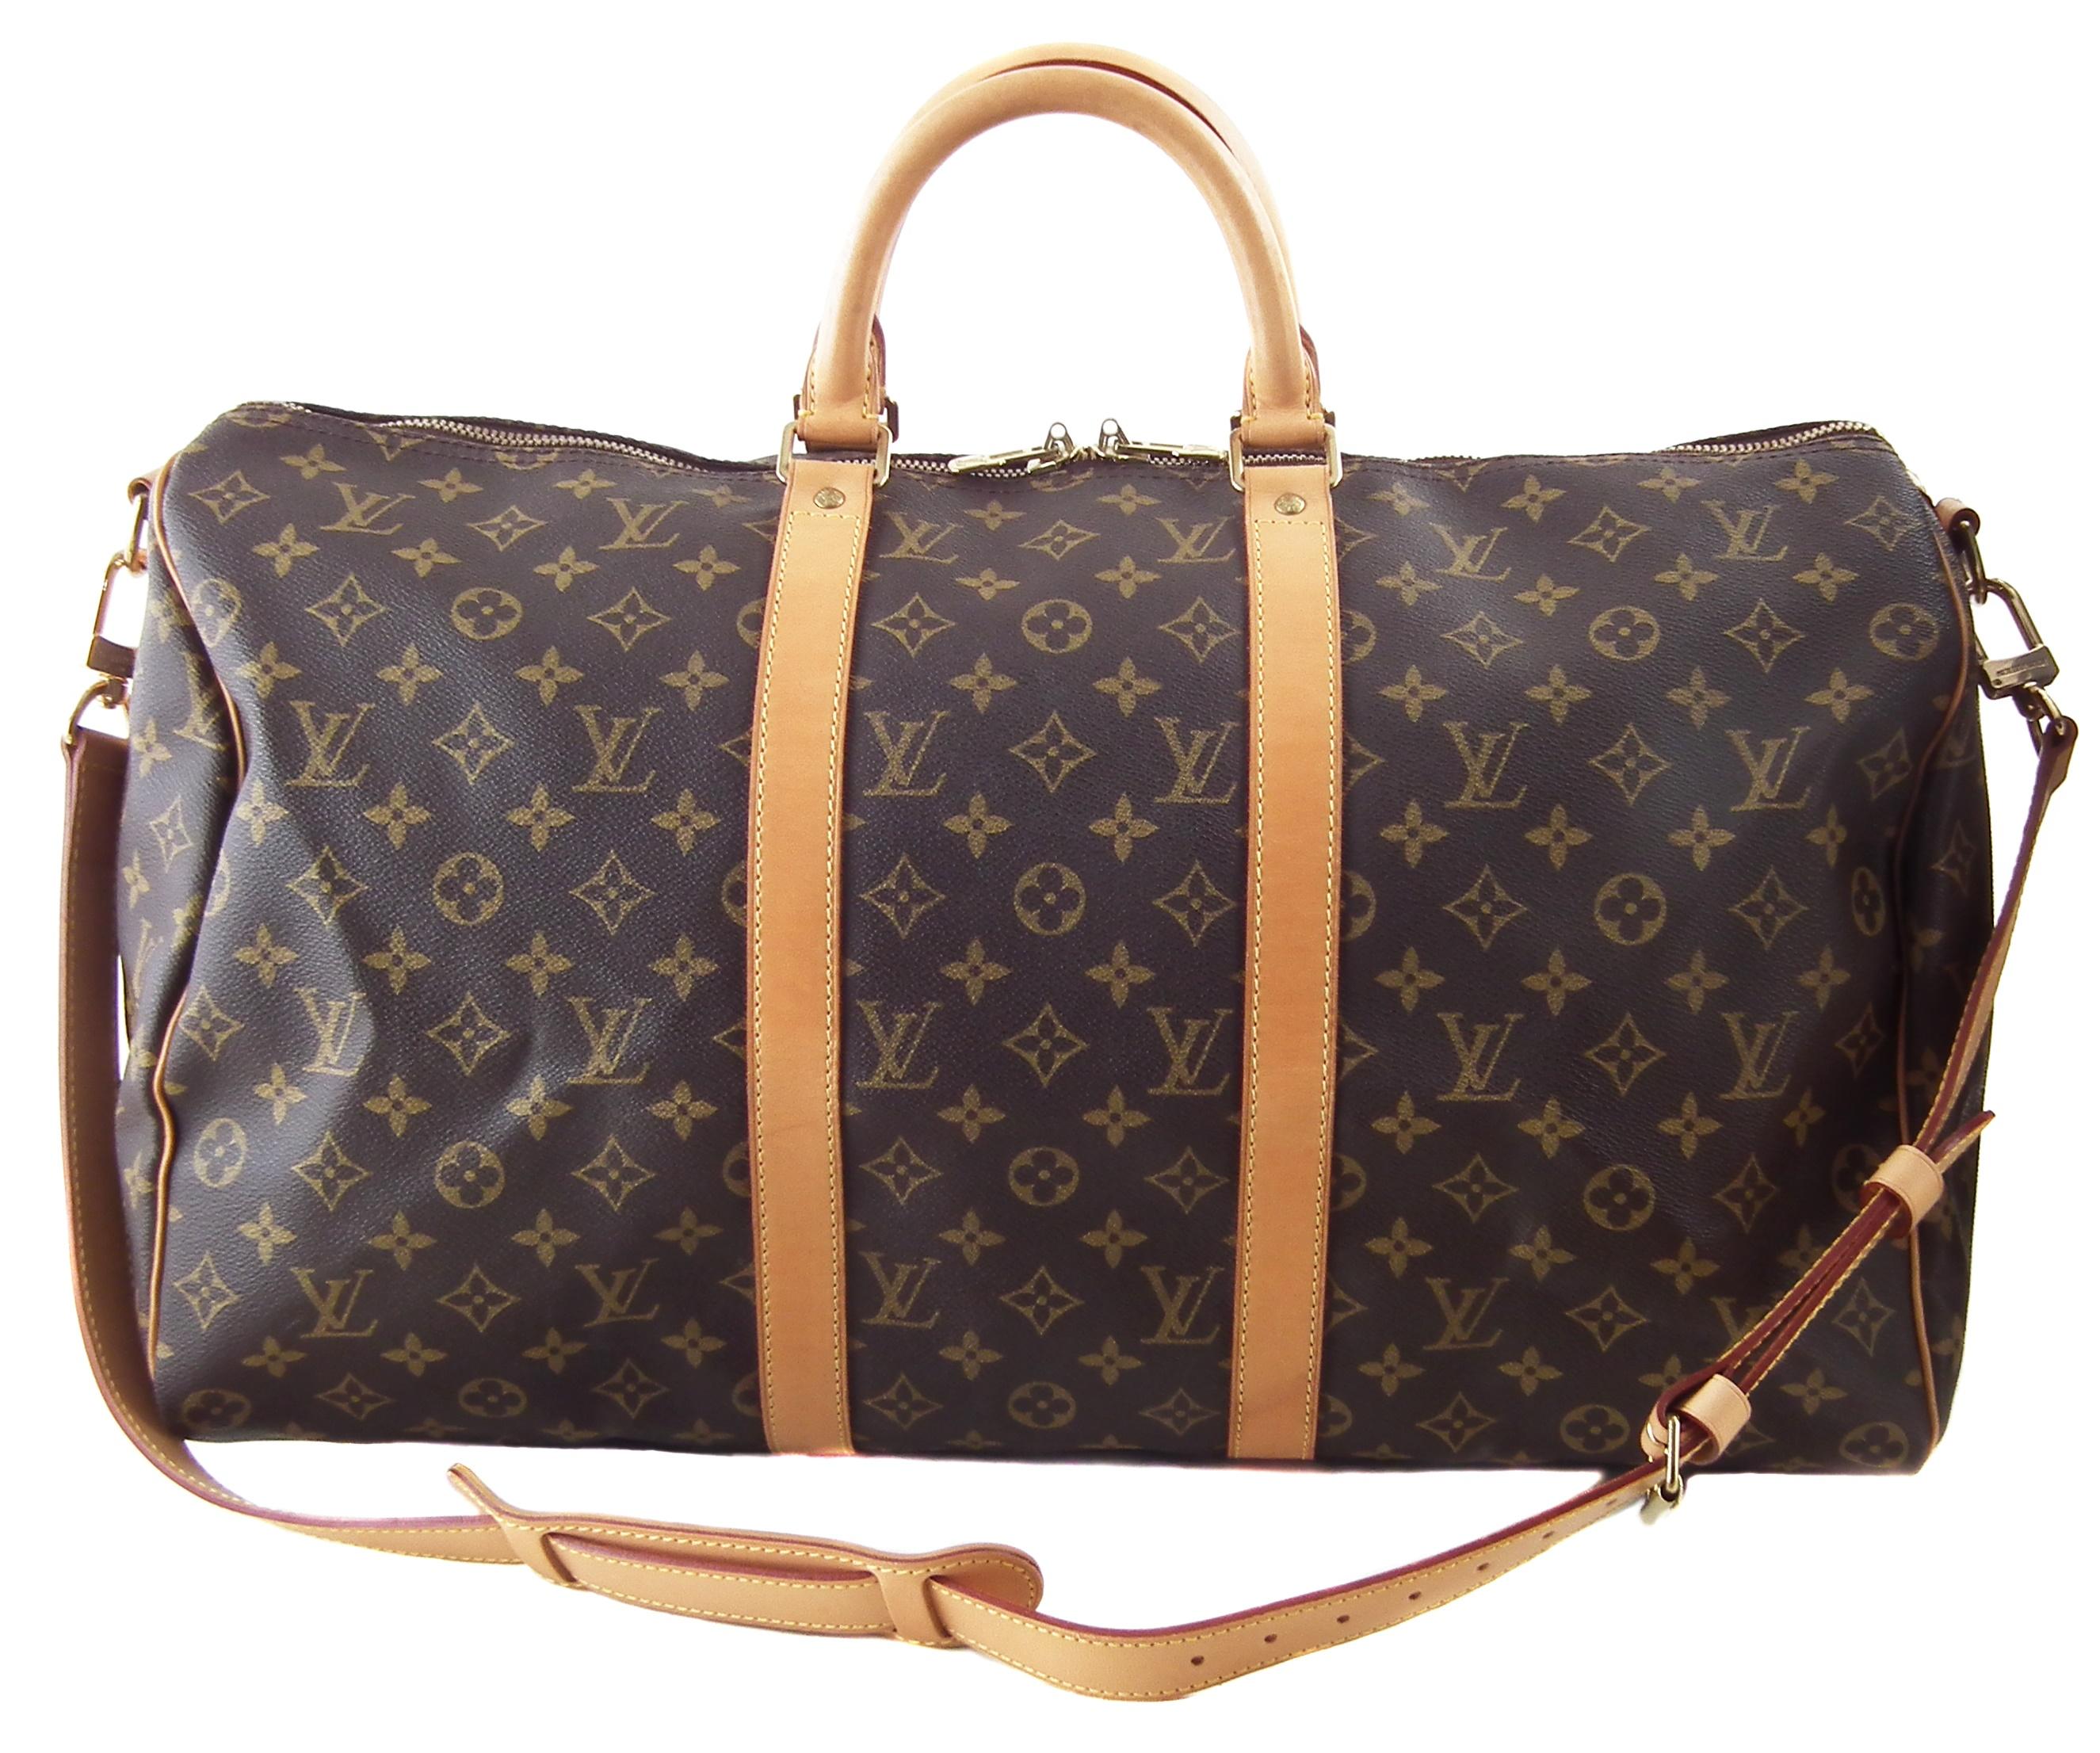 A Louis Vuitton monogram Keepall Bandoulière 50 luggage bag